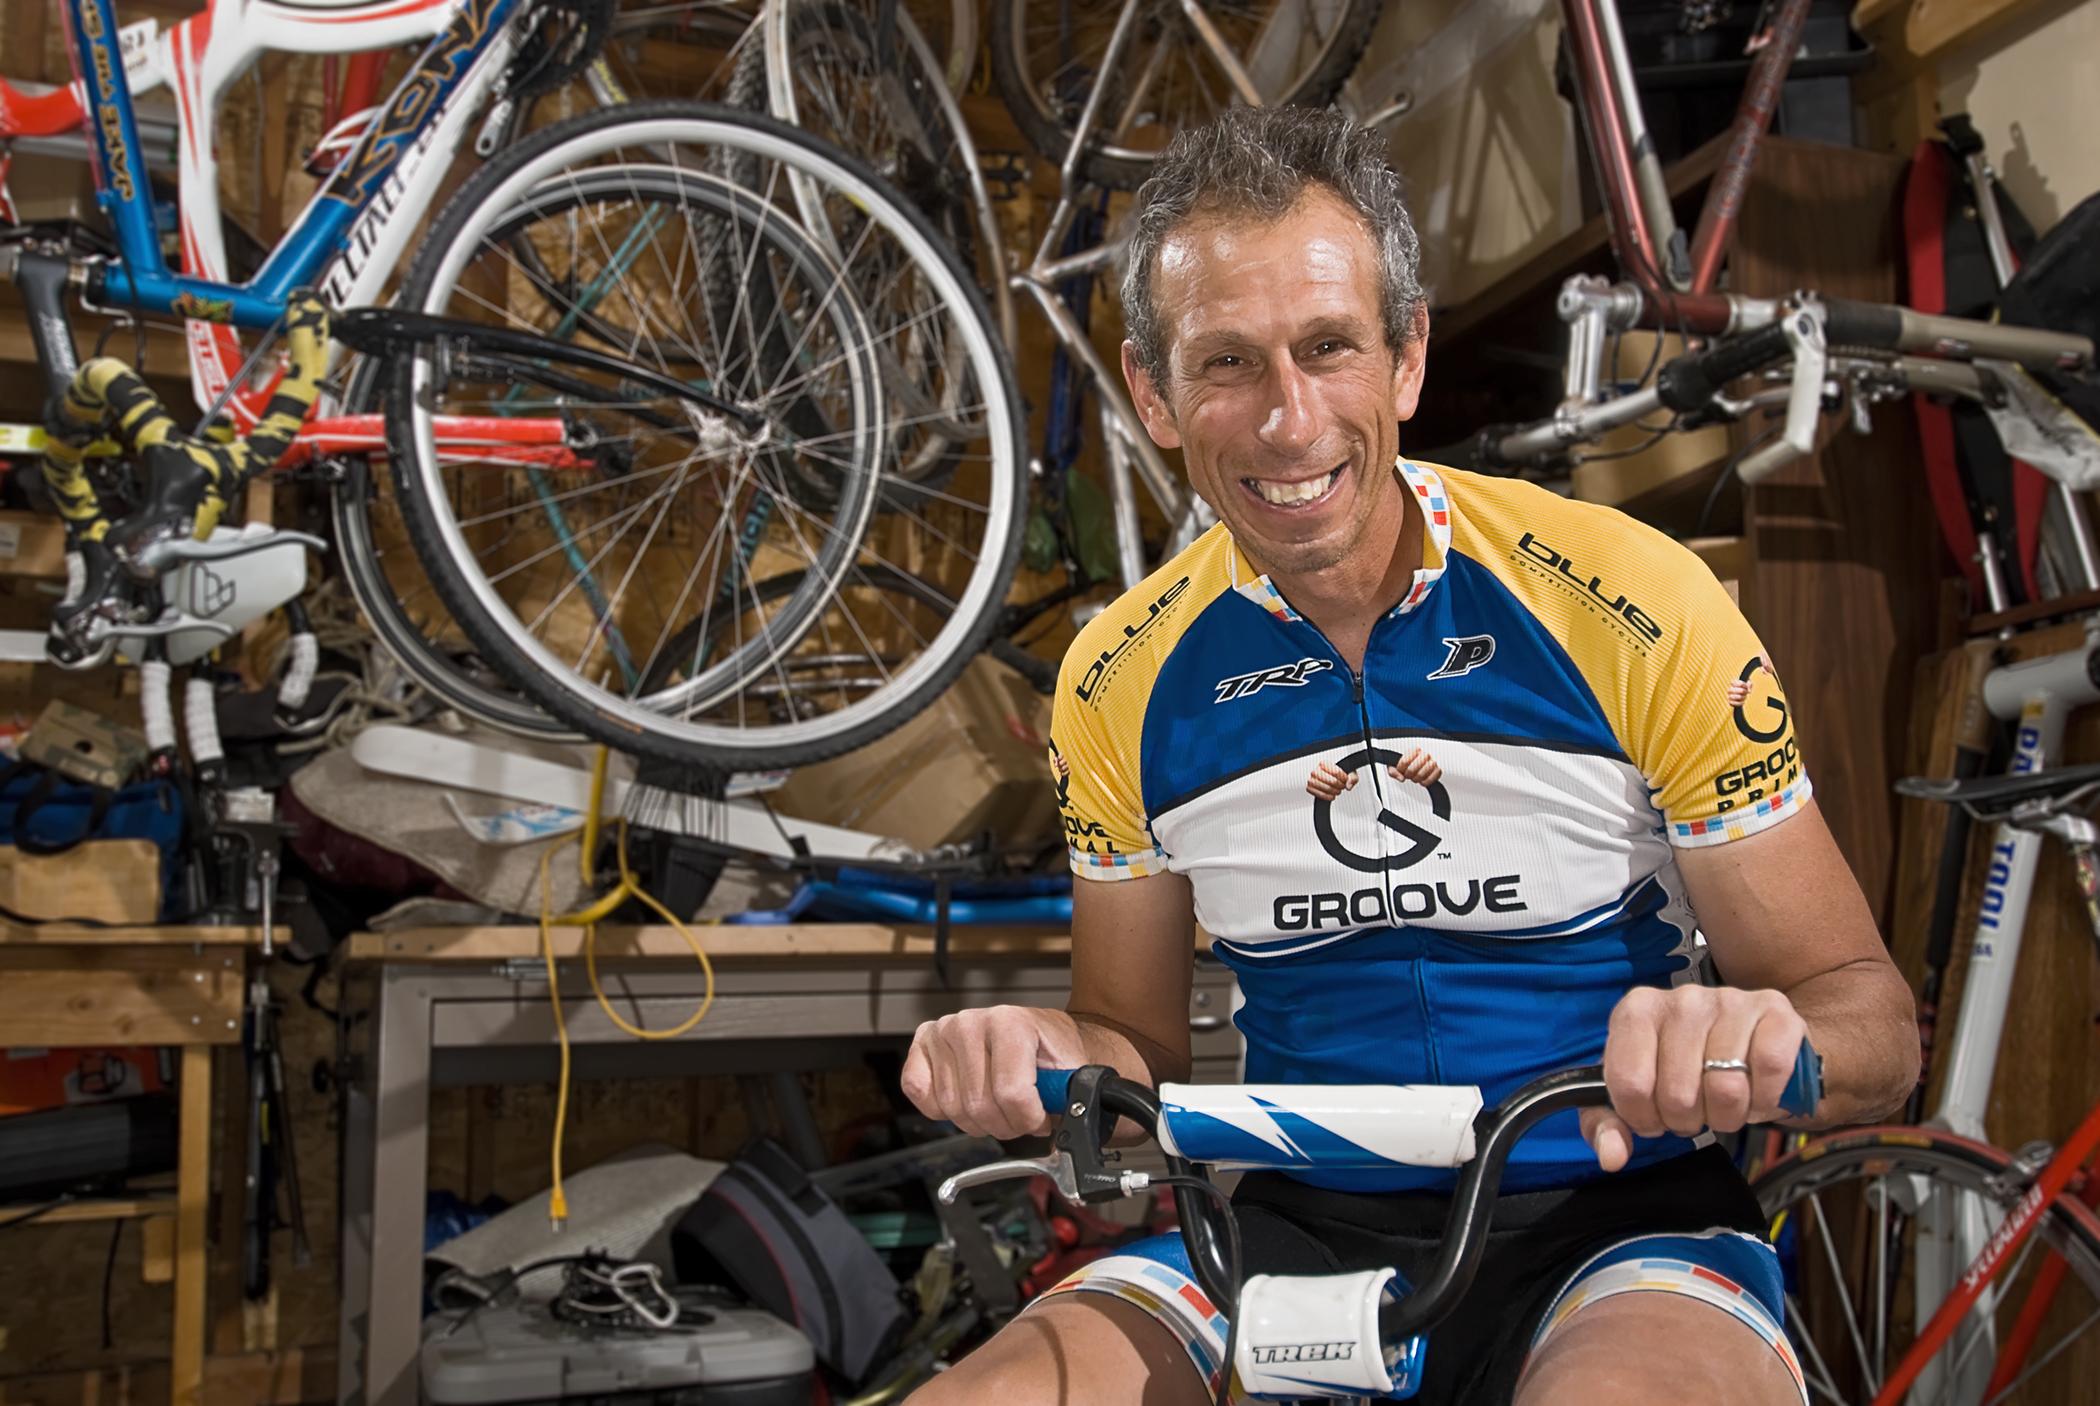 Dejan & his son's Trek for the My Favorite Bike Portrait Series.